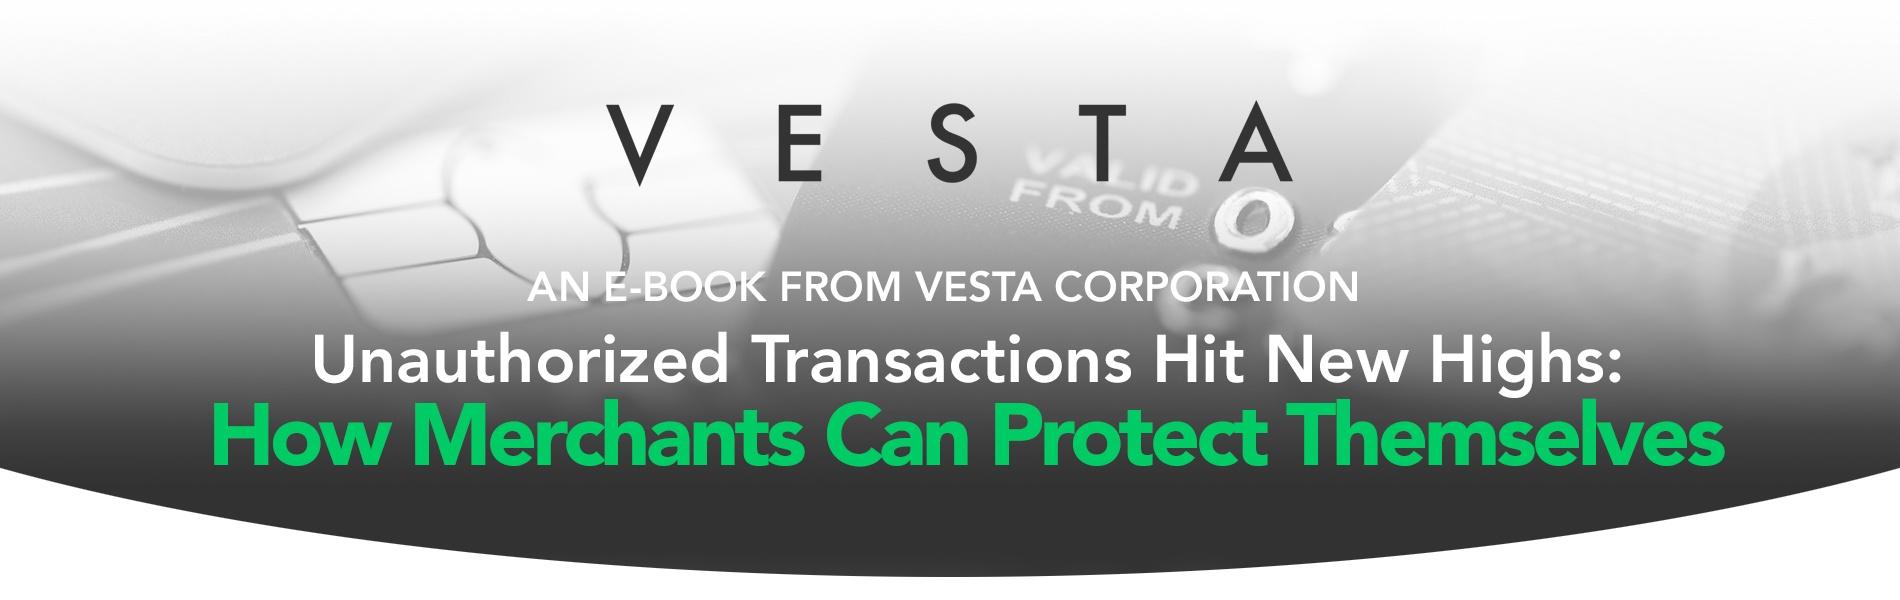 Unauthorized Transactions